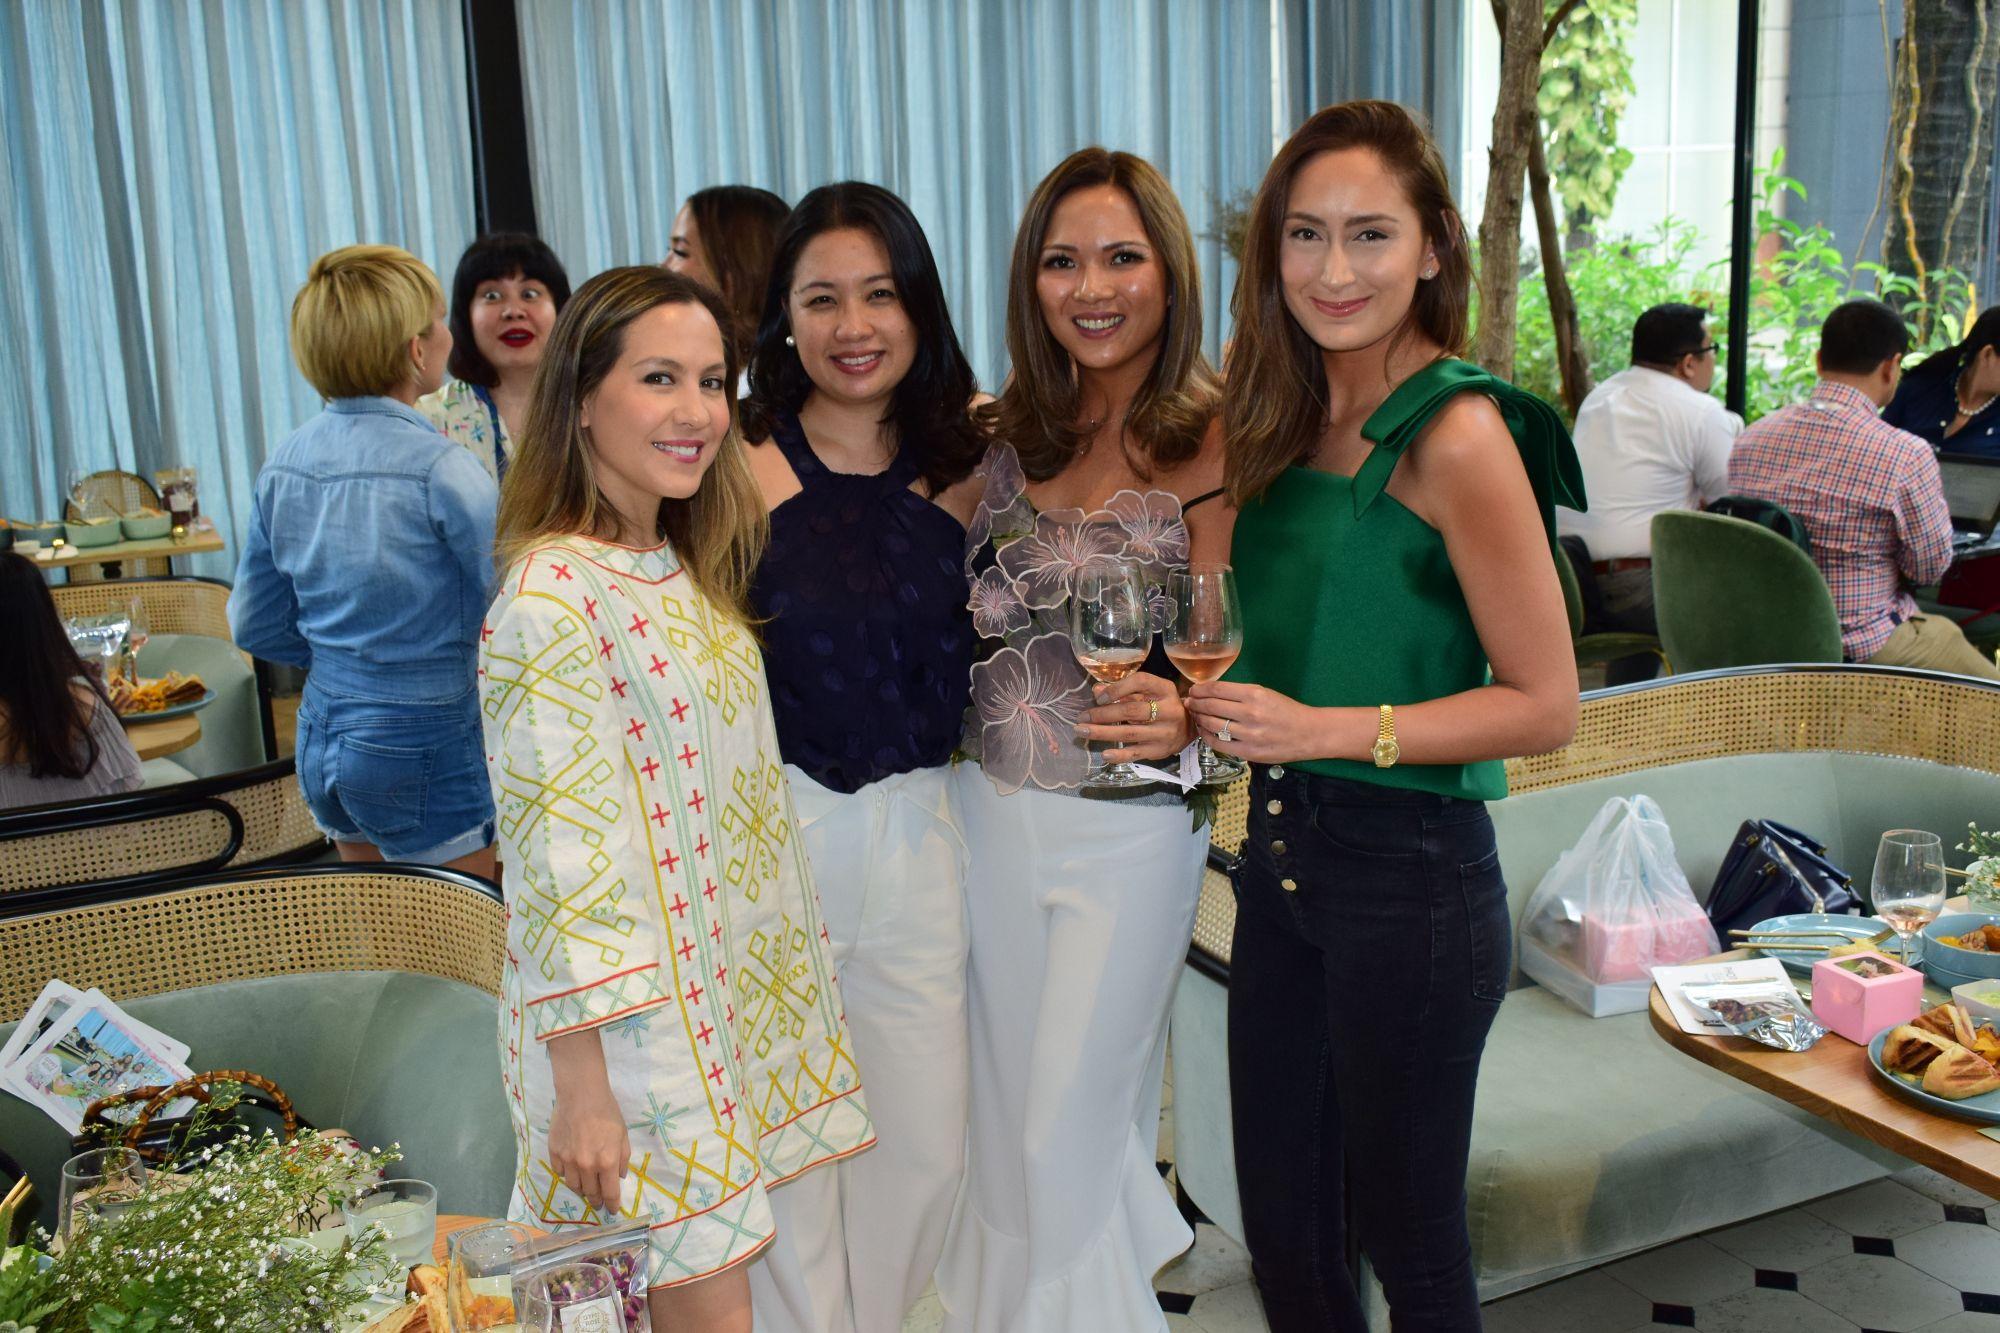 Jackie Antonio, Kim Cuerva, Monette Bata-Garcia and Krystle Bacani